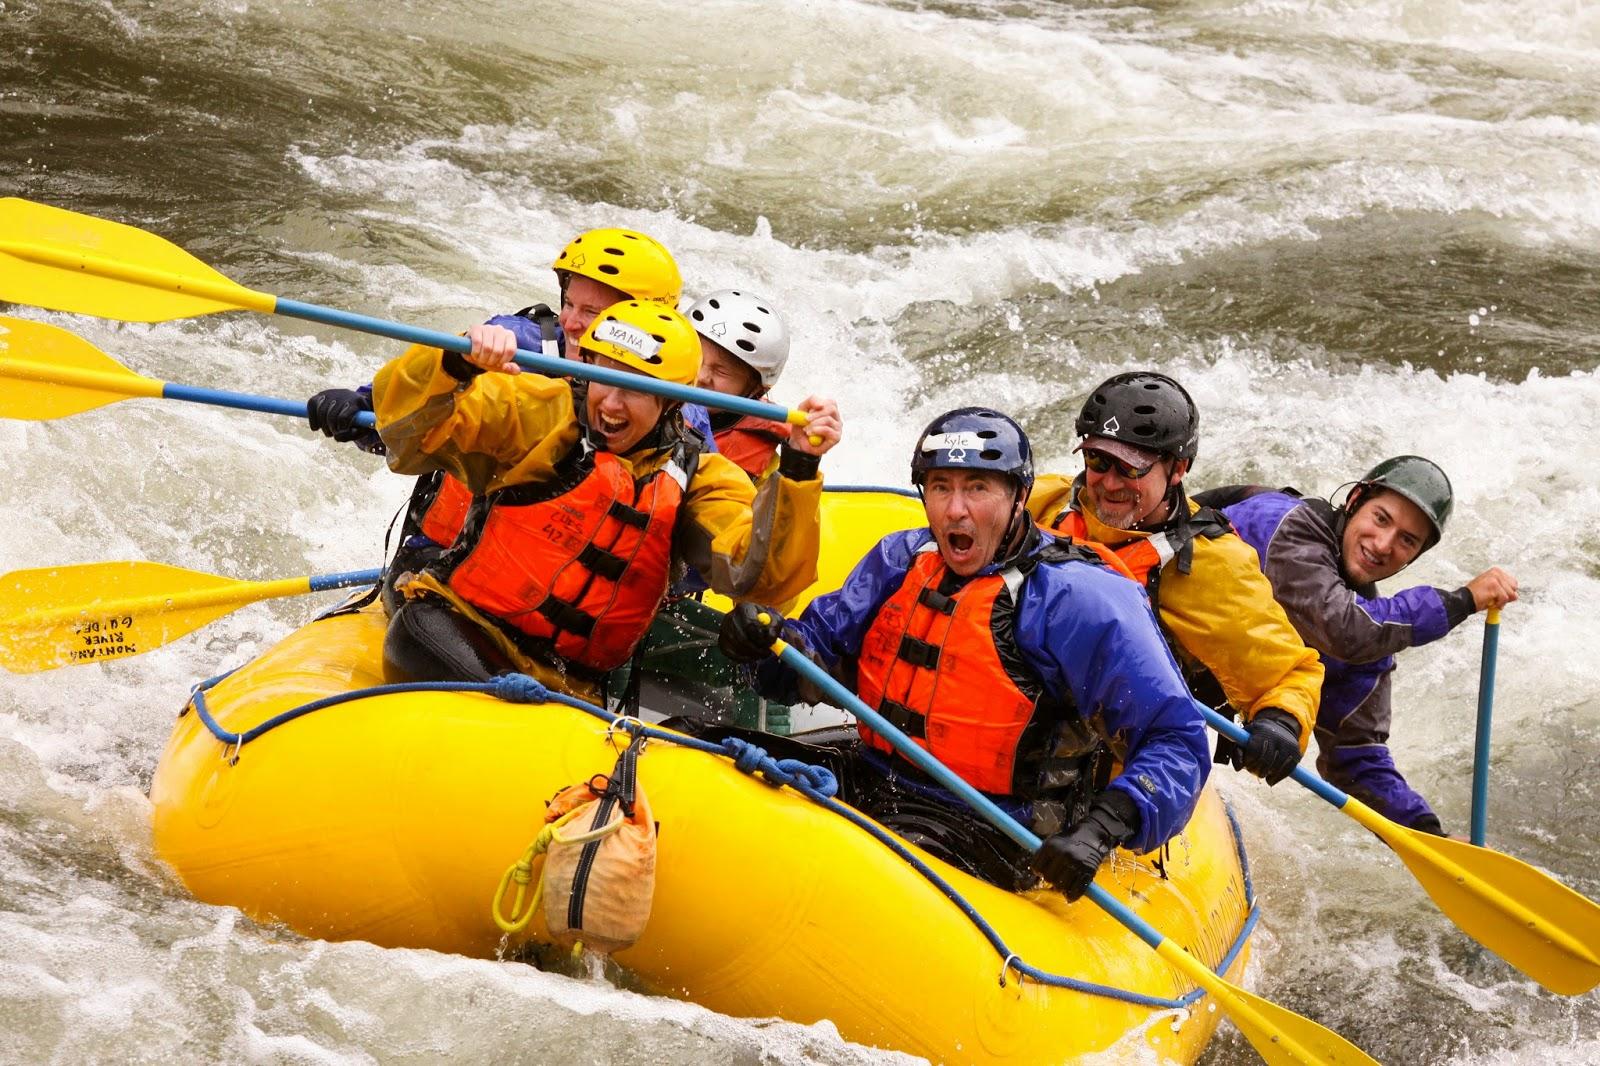 Raft Guide School, Whitewater Rafting Classes